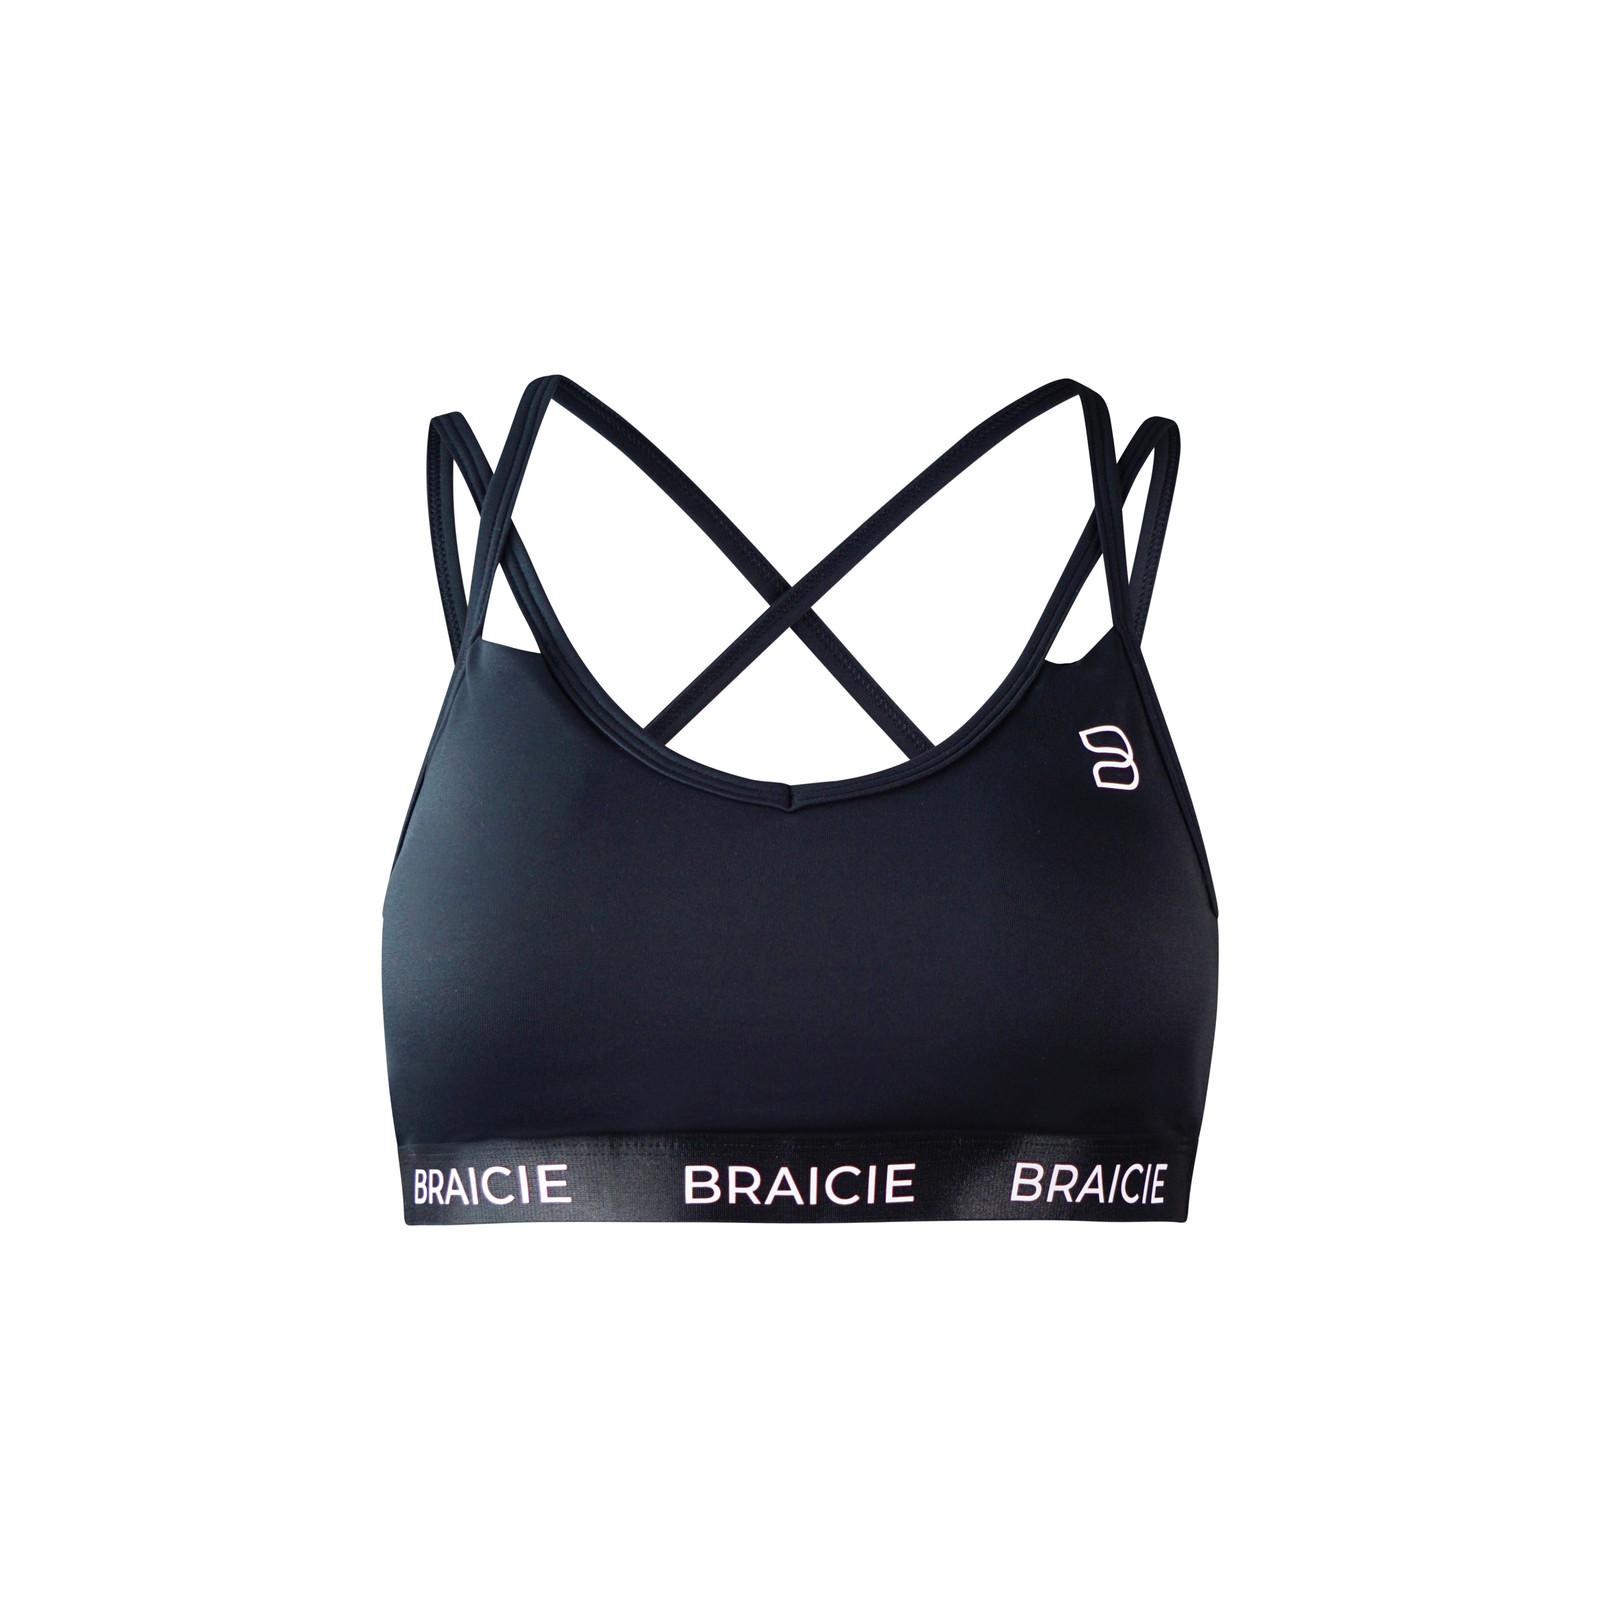 Braicie PASSION SPORT-BH IN BLACK